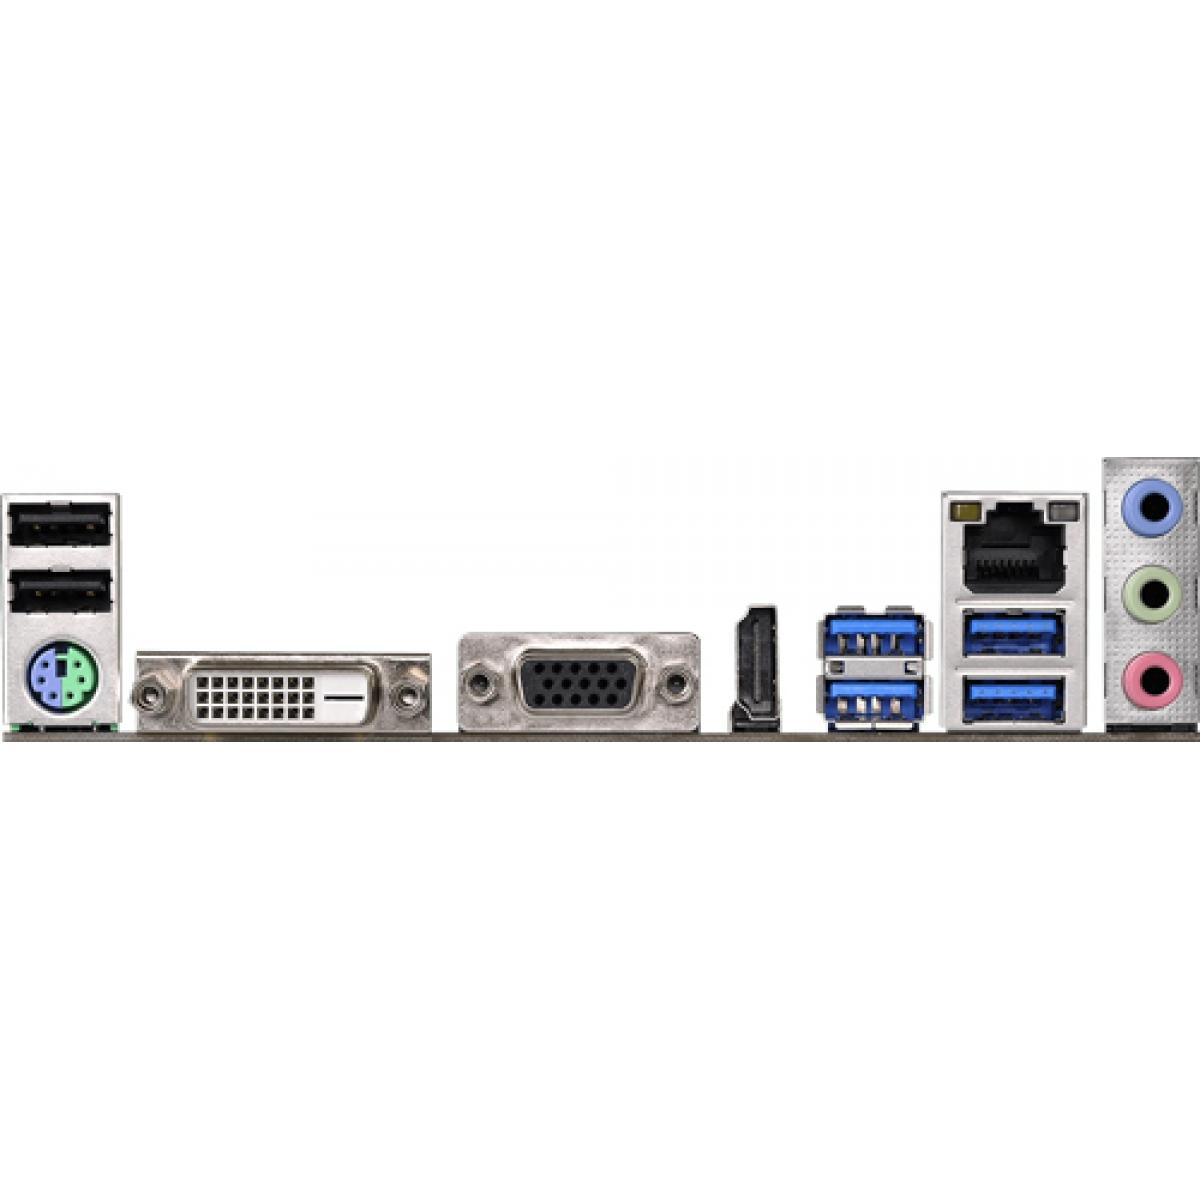 Placa Mãe ASRock AB350M-HDV, Chipset B350, AMD AM4, mATX, DDR4